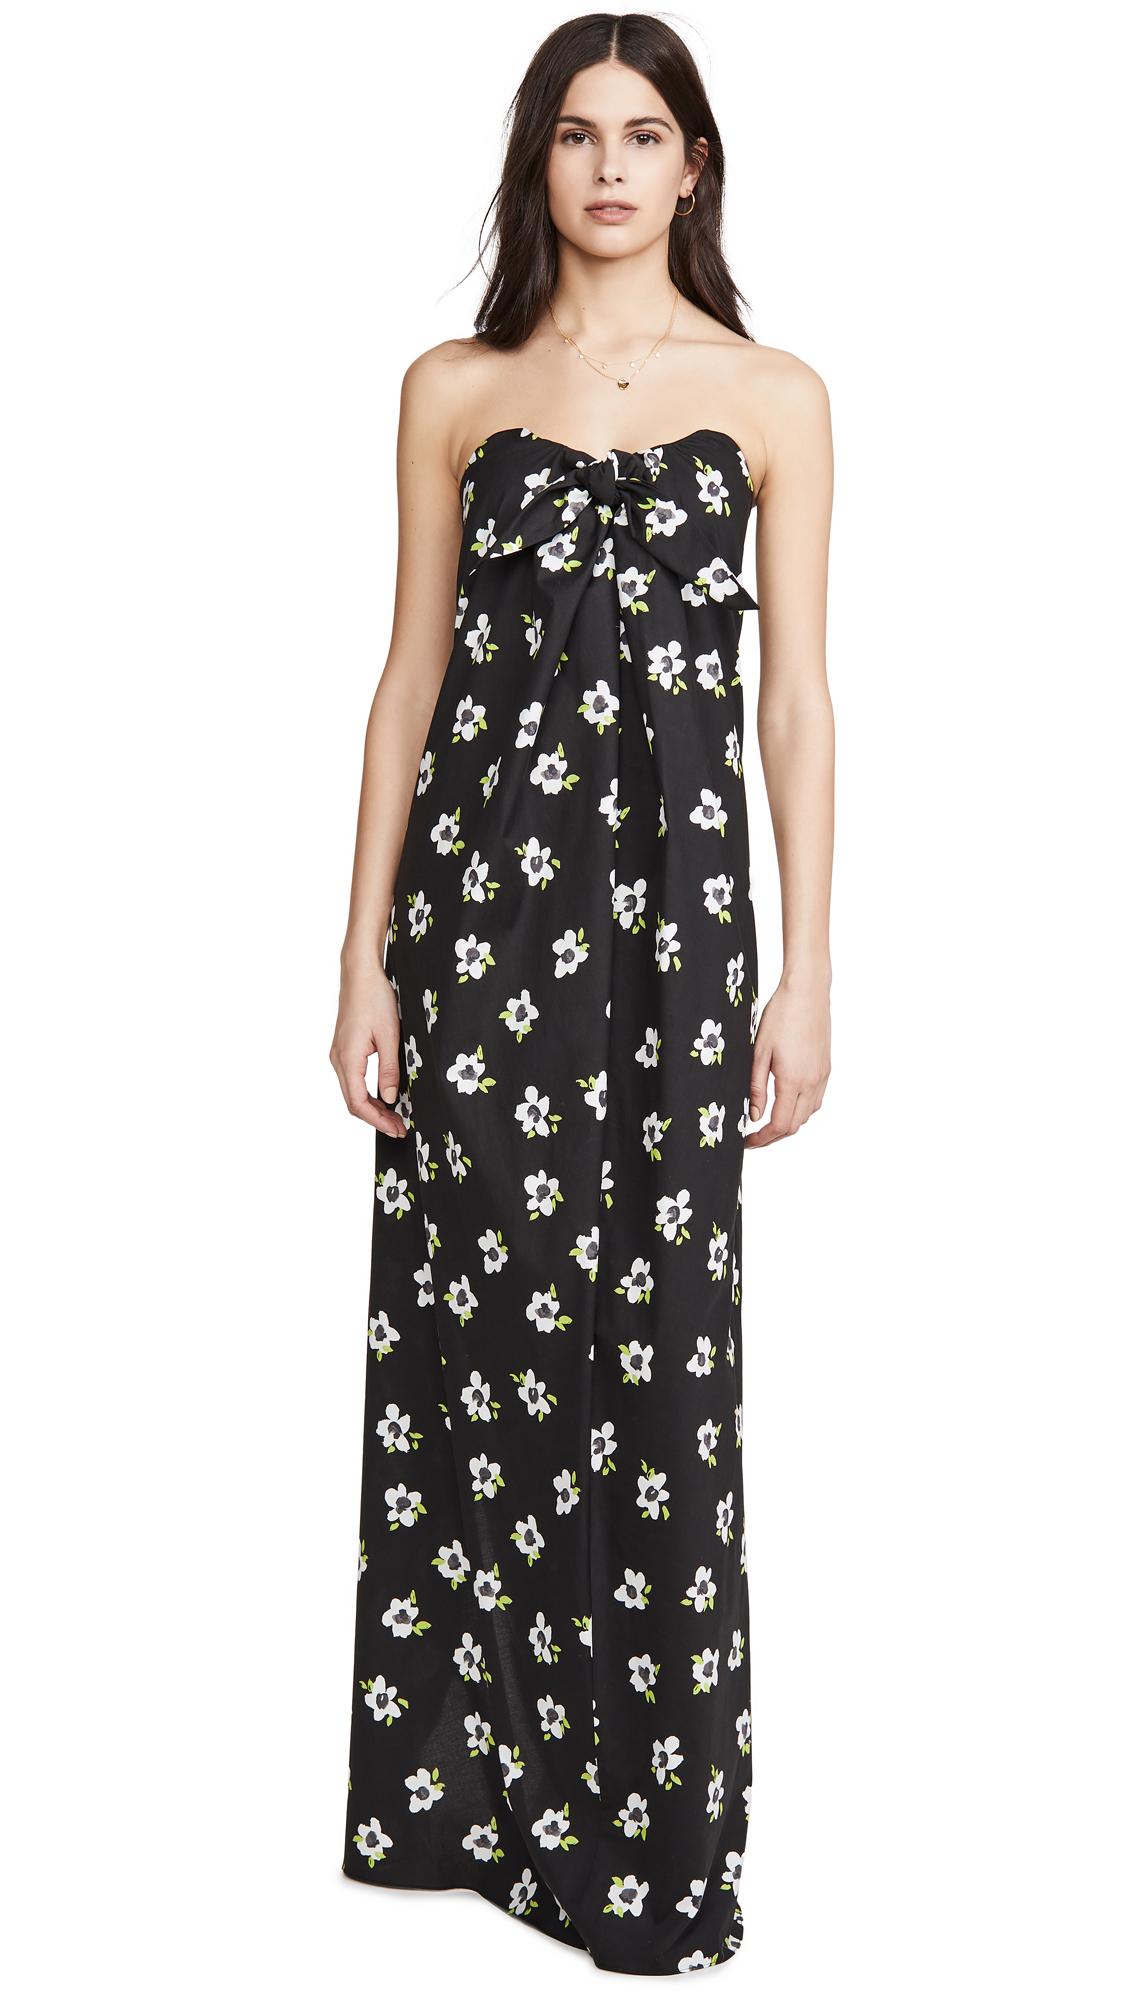 Caroline Constas Kaia Dress - 50% Off Sale